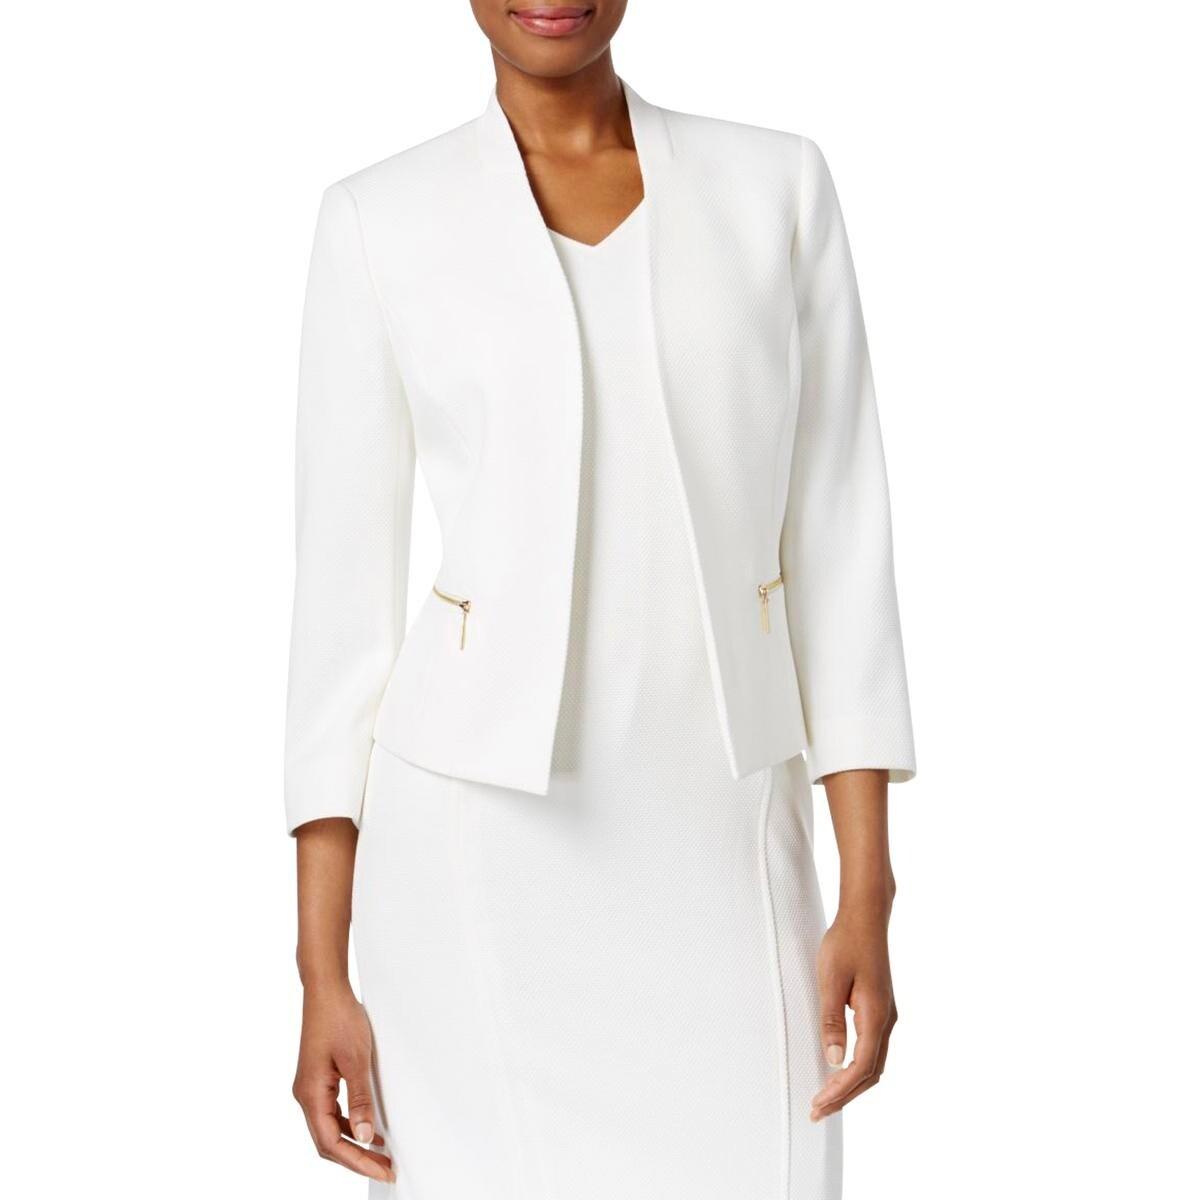 fa2b2387ddf74 Shop Kasper Womens Open-Front Blazer Textured Zip Pockets - Free Shipping  Today - Overstock.com - 22581553